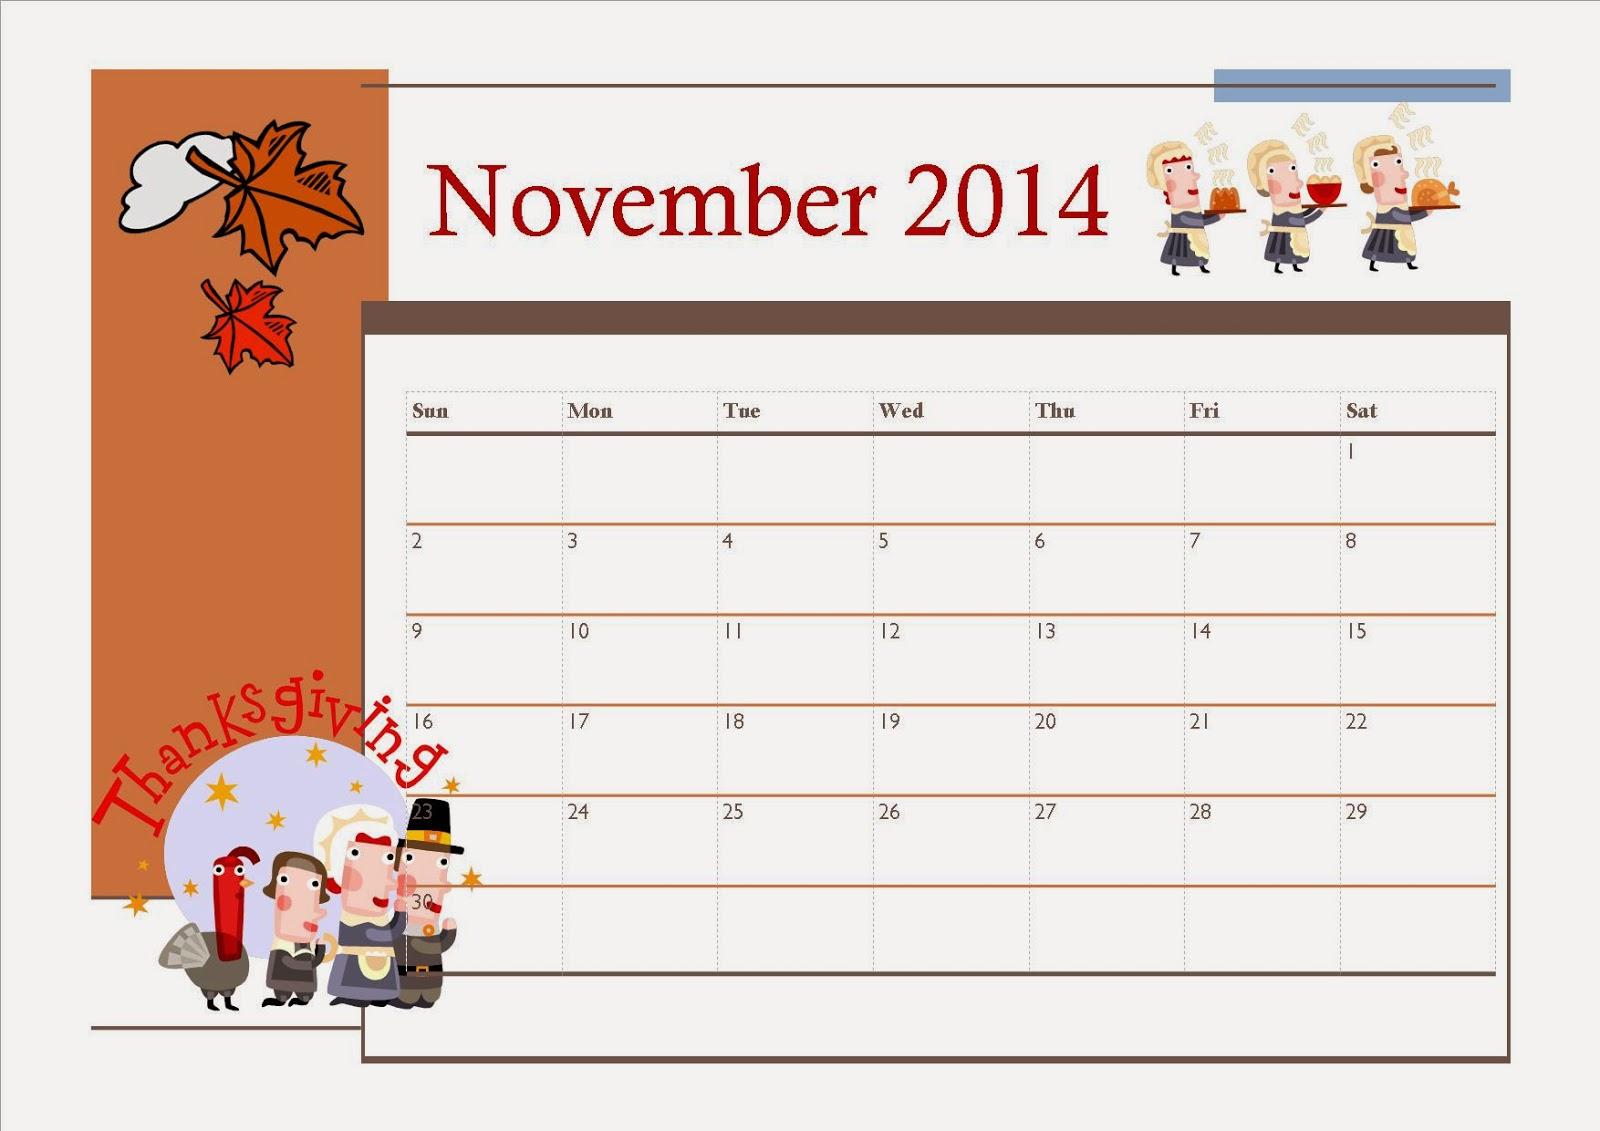 Free Printable November 2014 Calendar For Kids